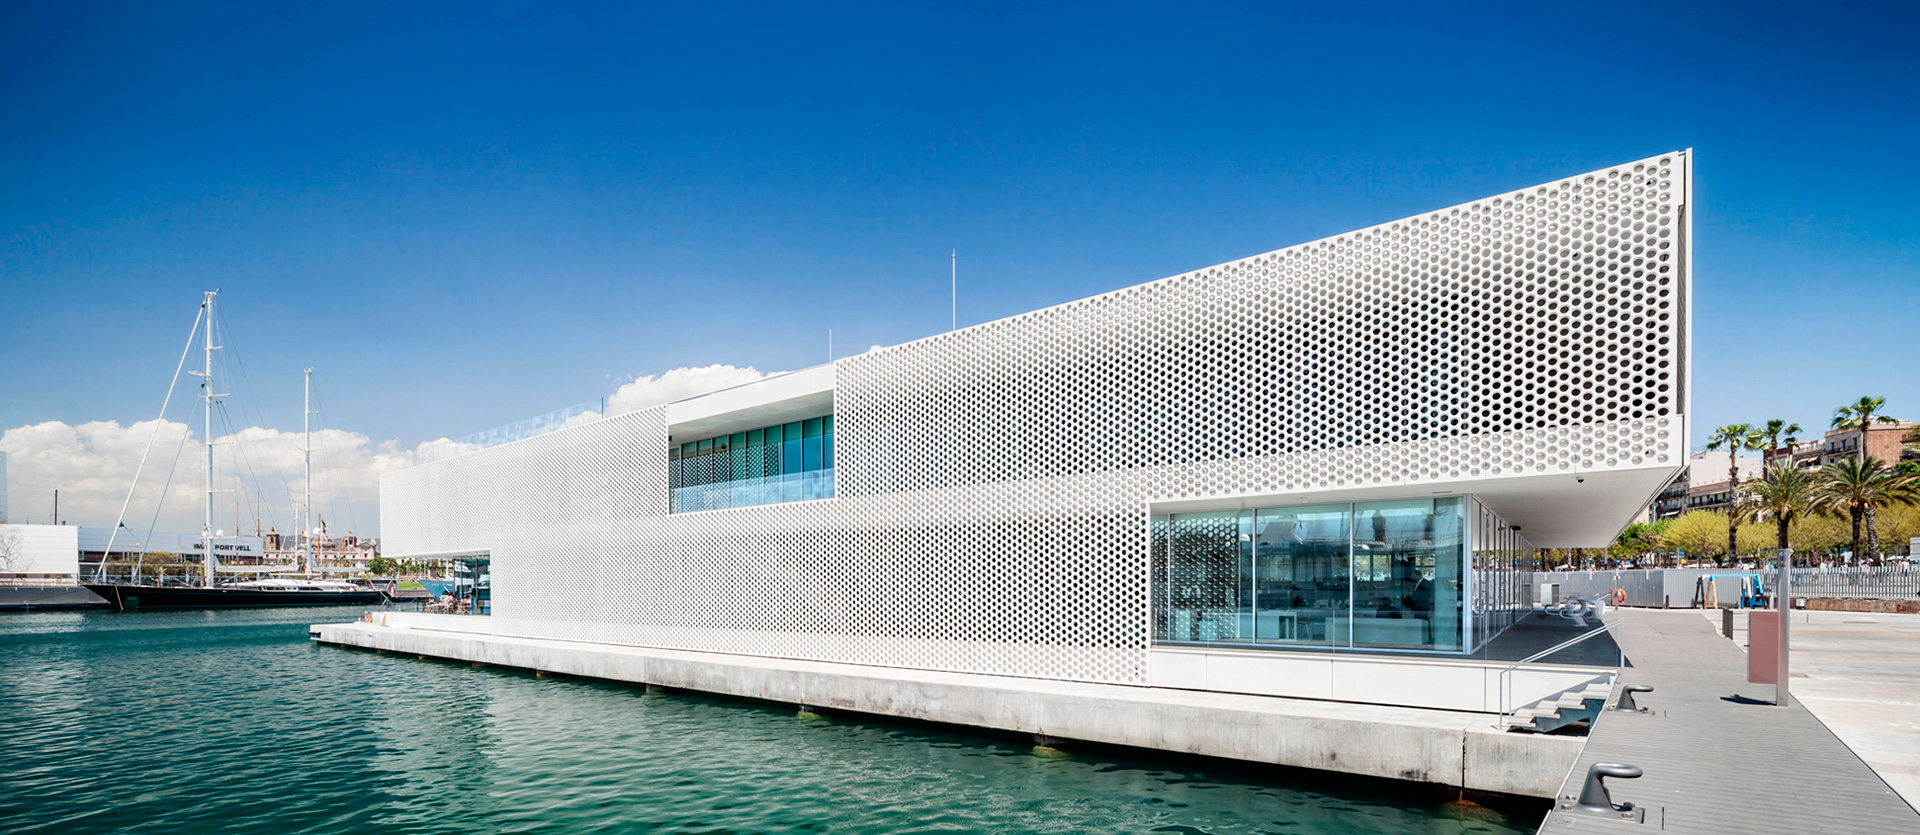 Marina port vell por scob the gallery ii metalocus for One ocean club barcelona